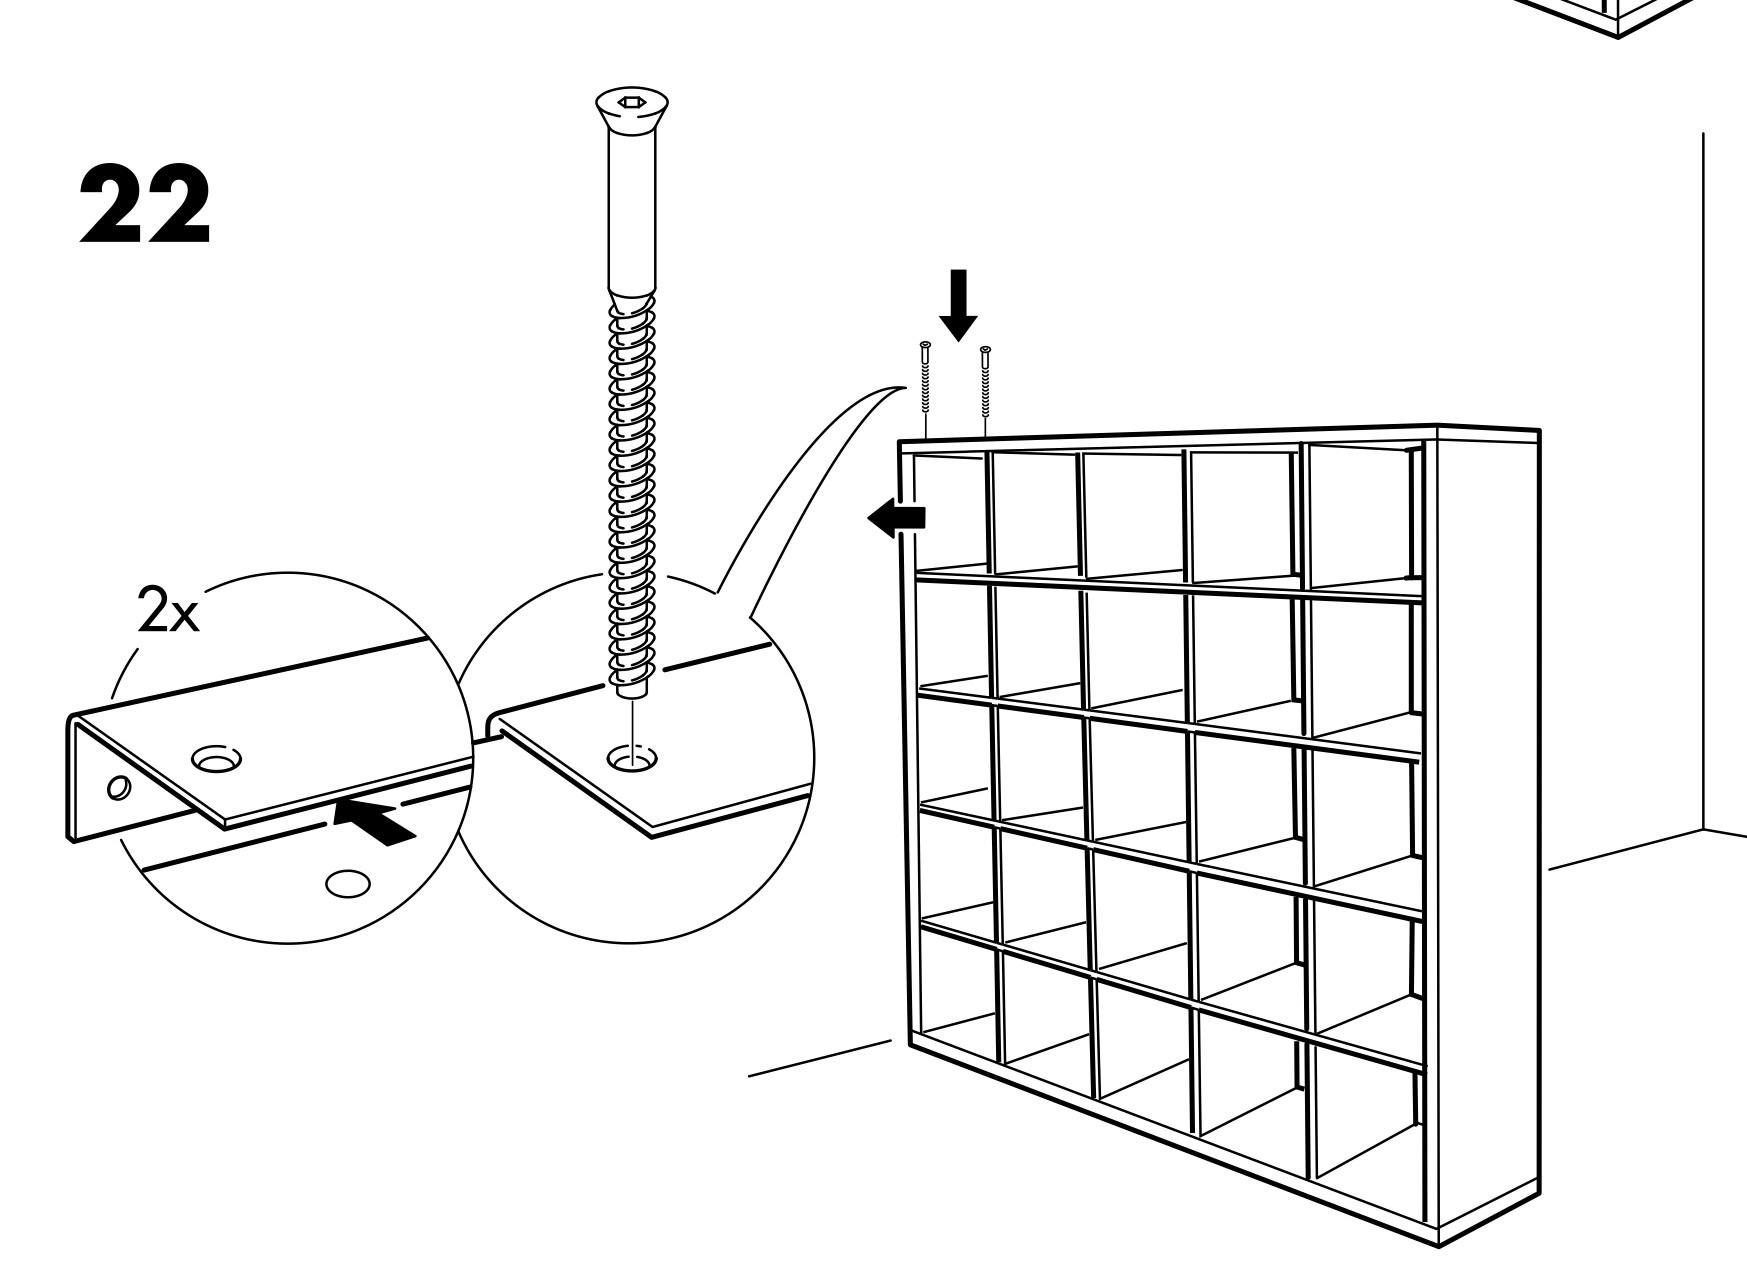 Jugendzimmer Mit Ikea Einrichten ~ http  tweakers net ext f u2N62O9s3nVJfoMVJFN44g0T full jpg